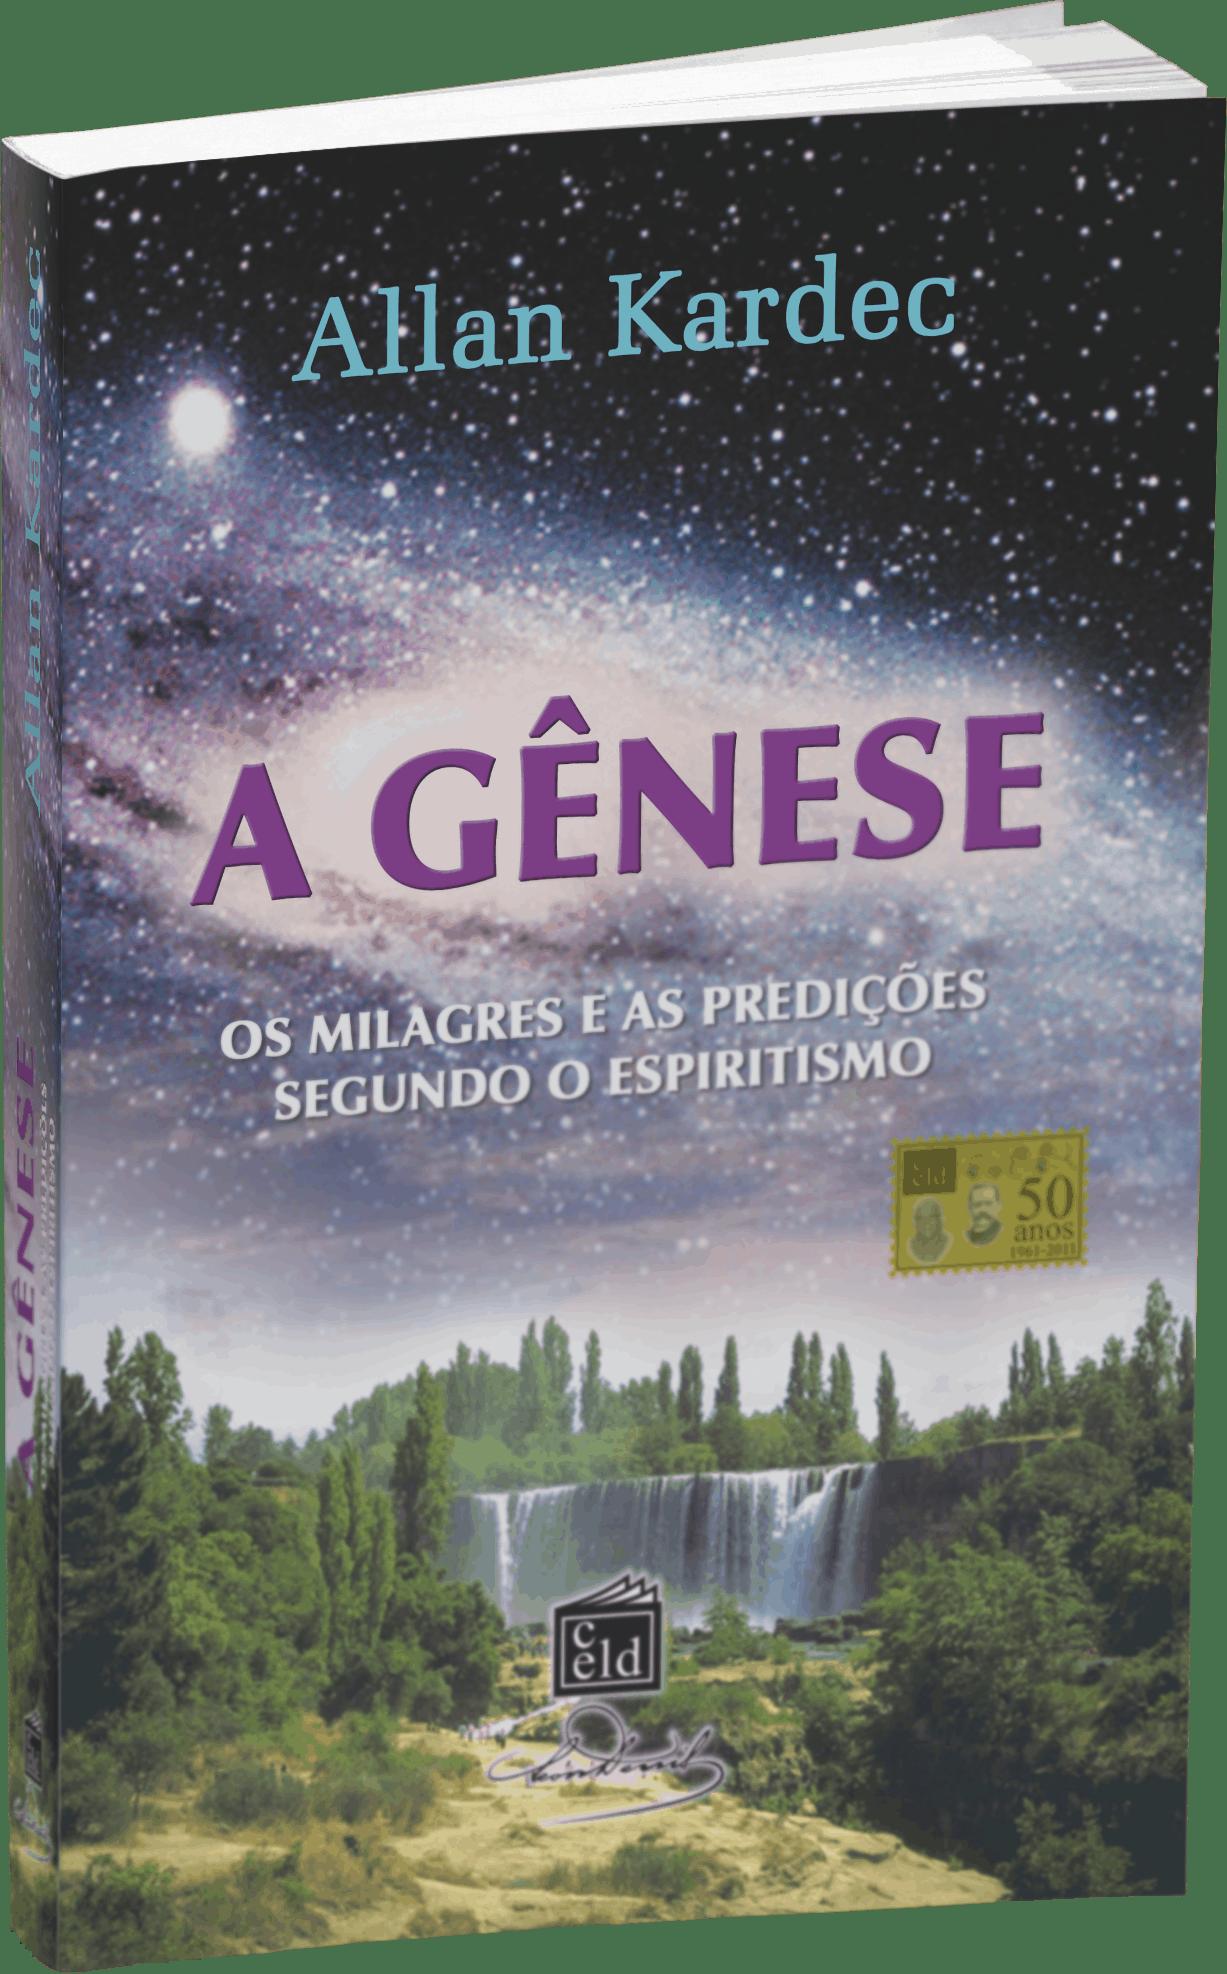 Genese-celd